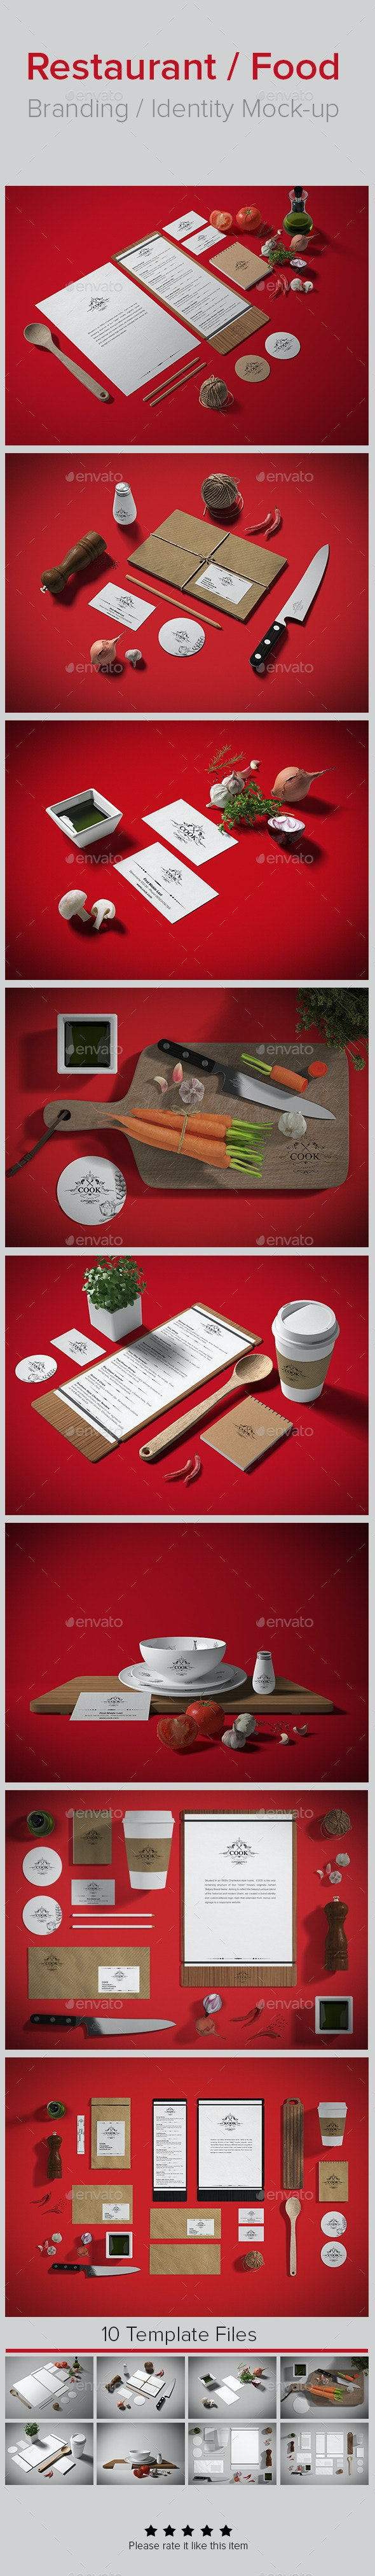 Restaurant / Food Branding Identity Mock-up - Stationery Print